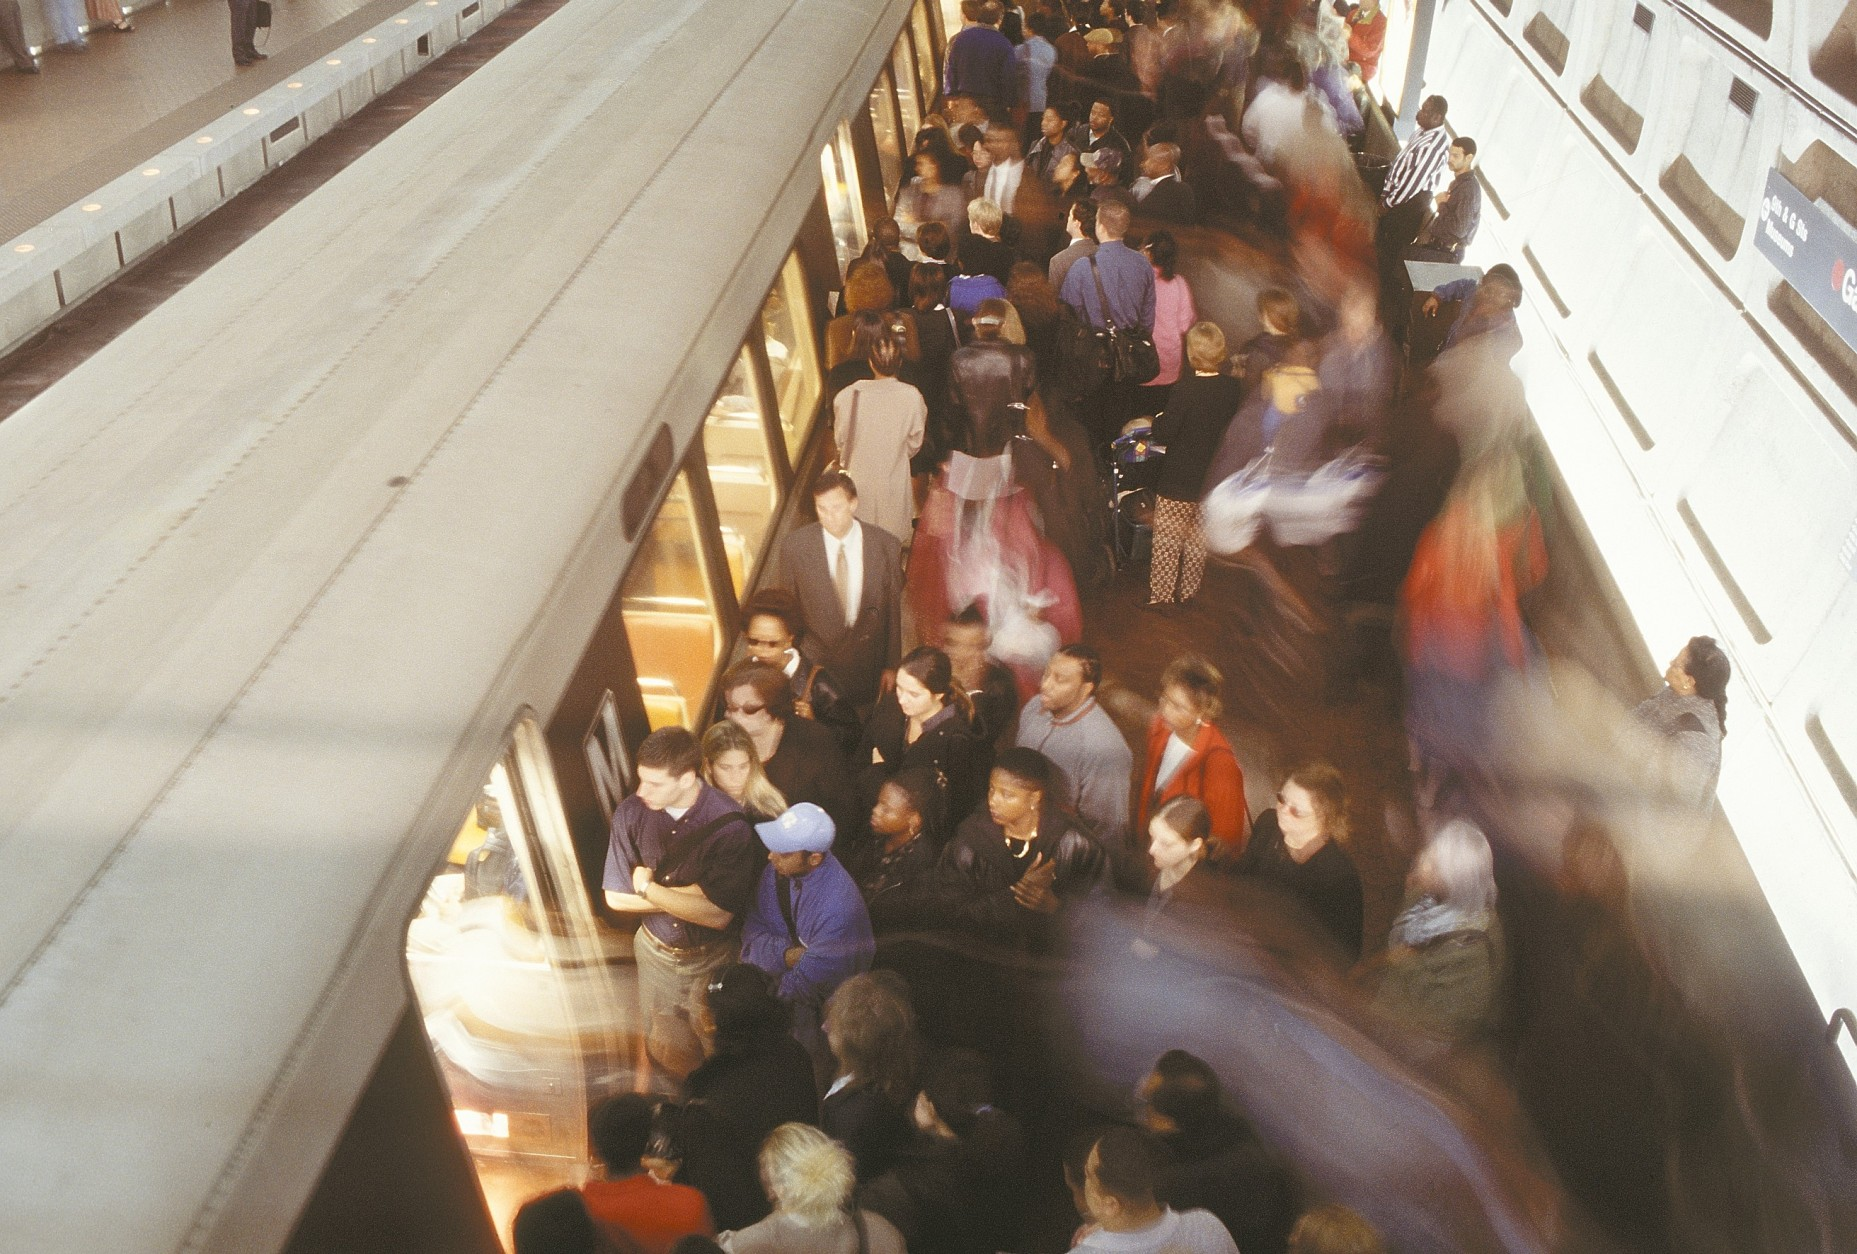 Metro board committees to take up service cut plan, ridership drop